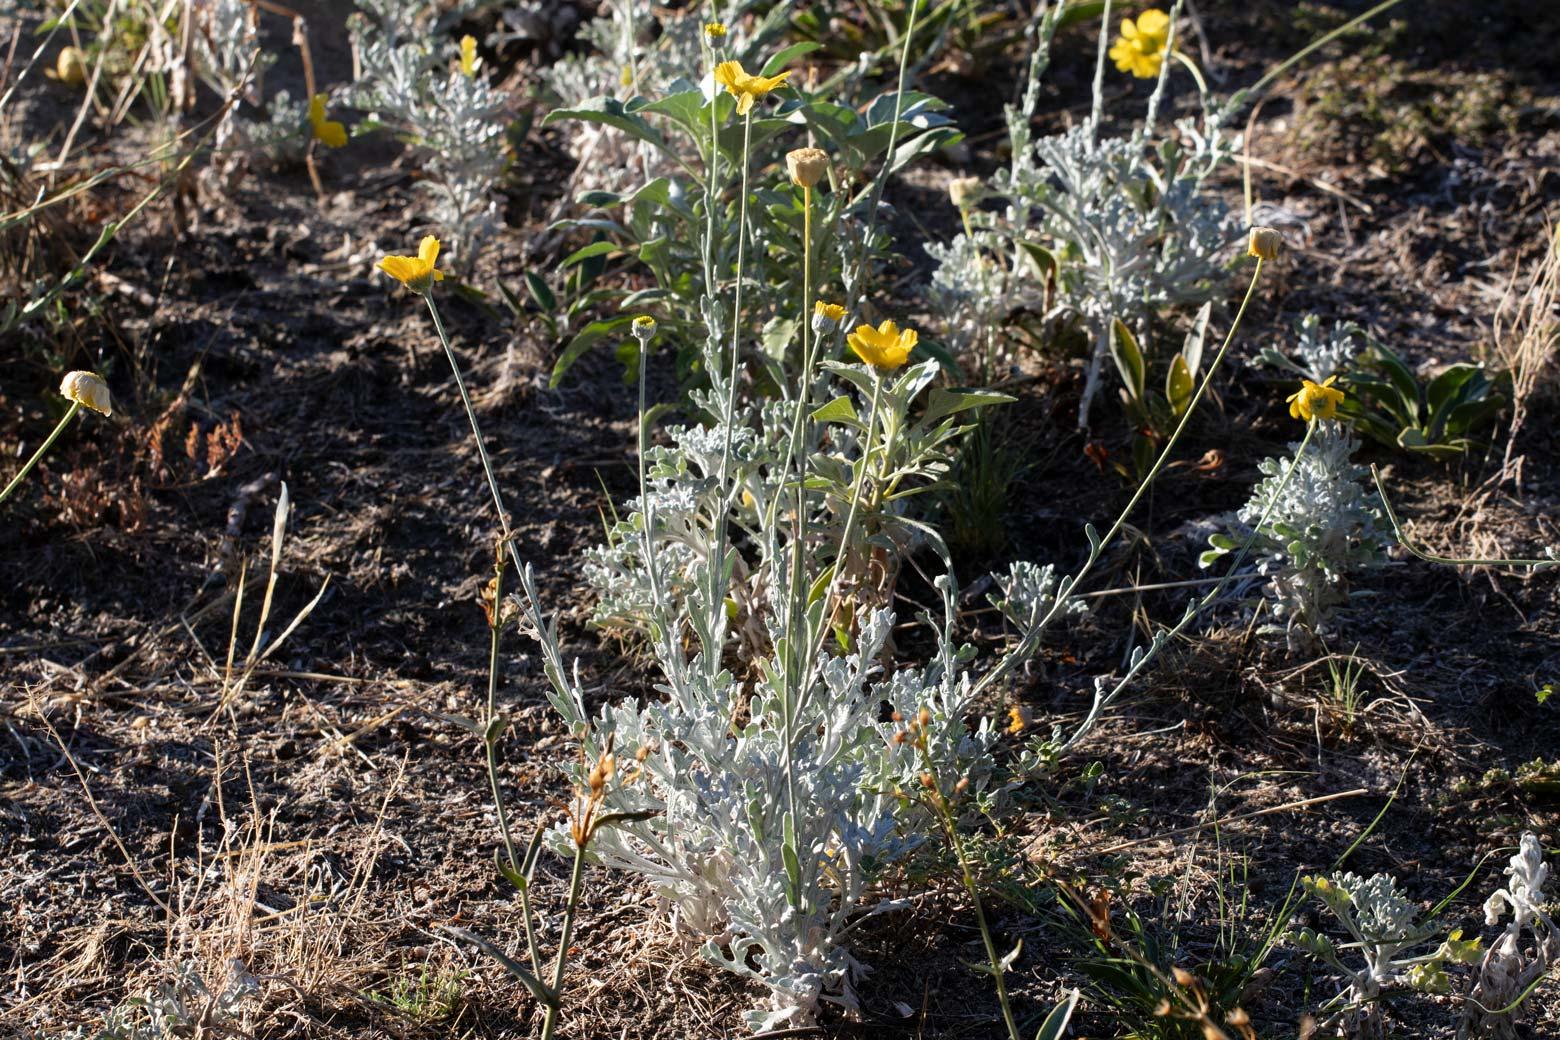 Desert Marigold blooms in the Wildflower Field at Sunnylands Center and Gardens.